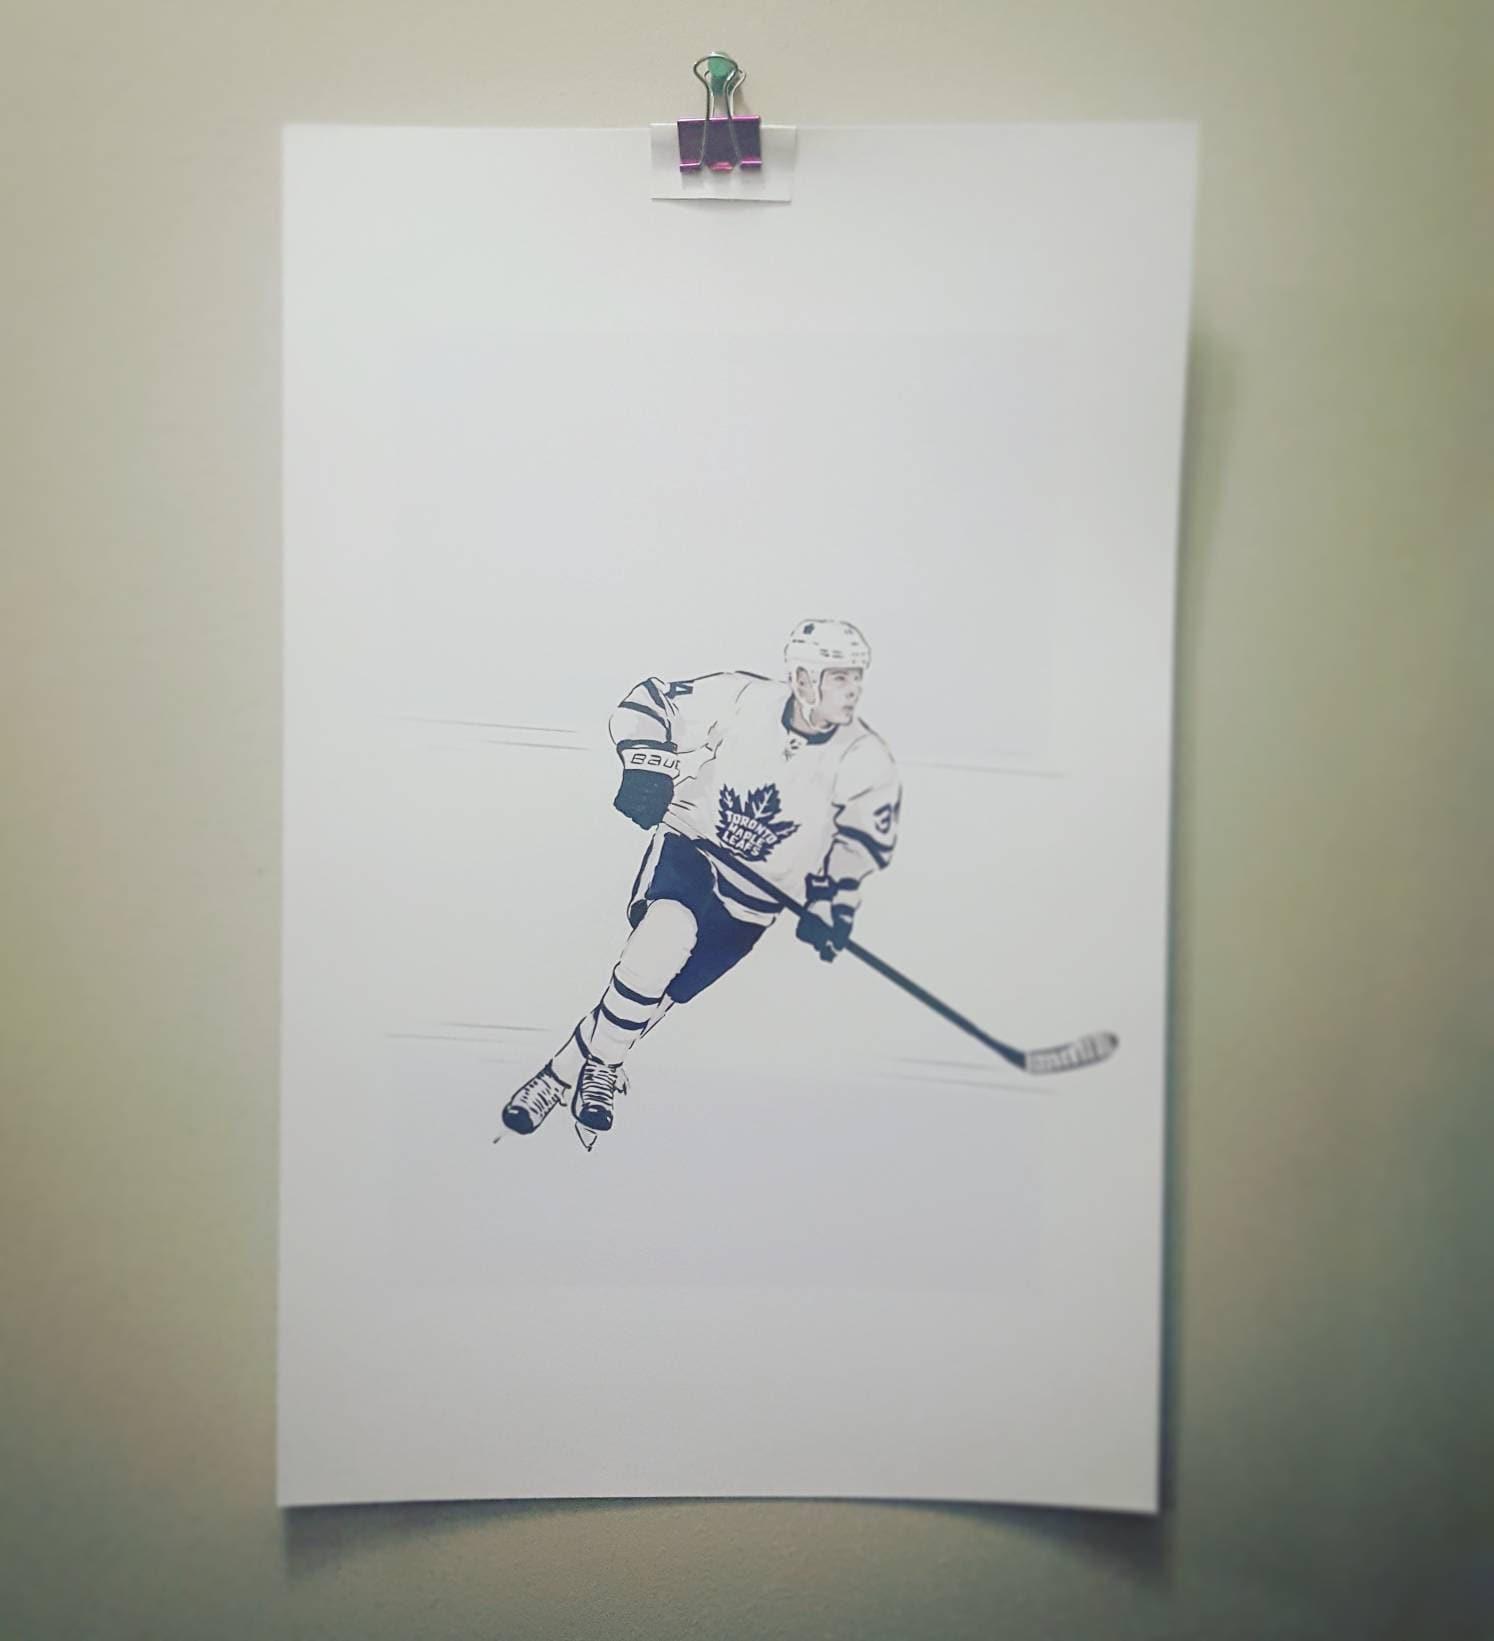 Auston Matthews Toronto Maple Leafs High Quality Print Etsy